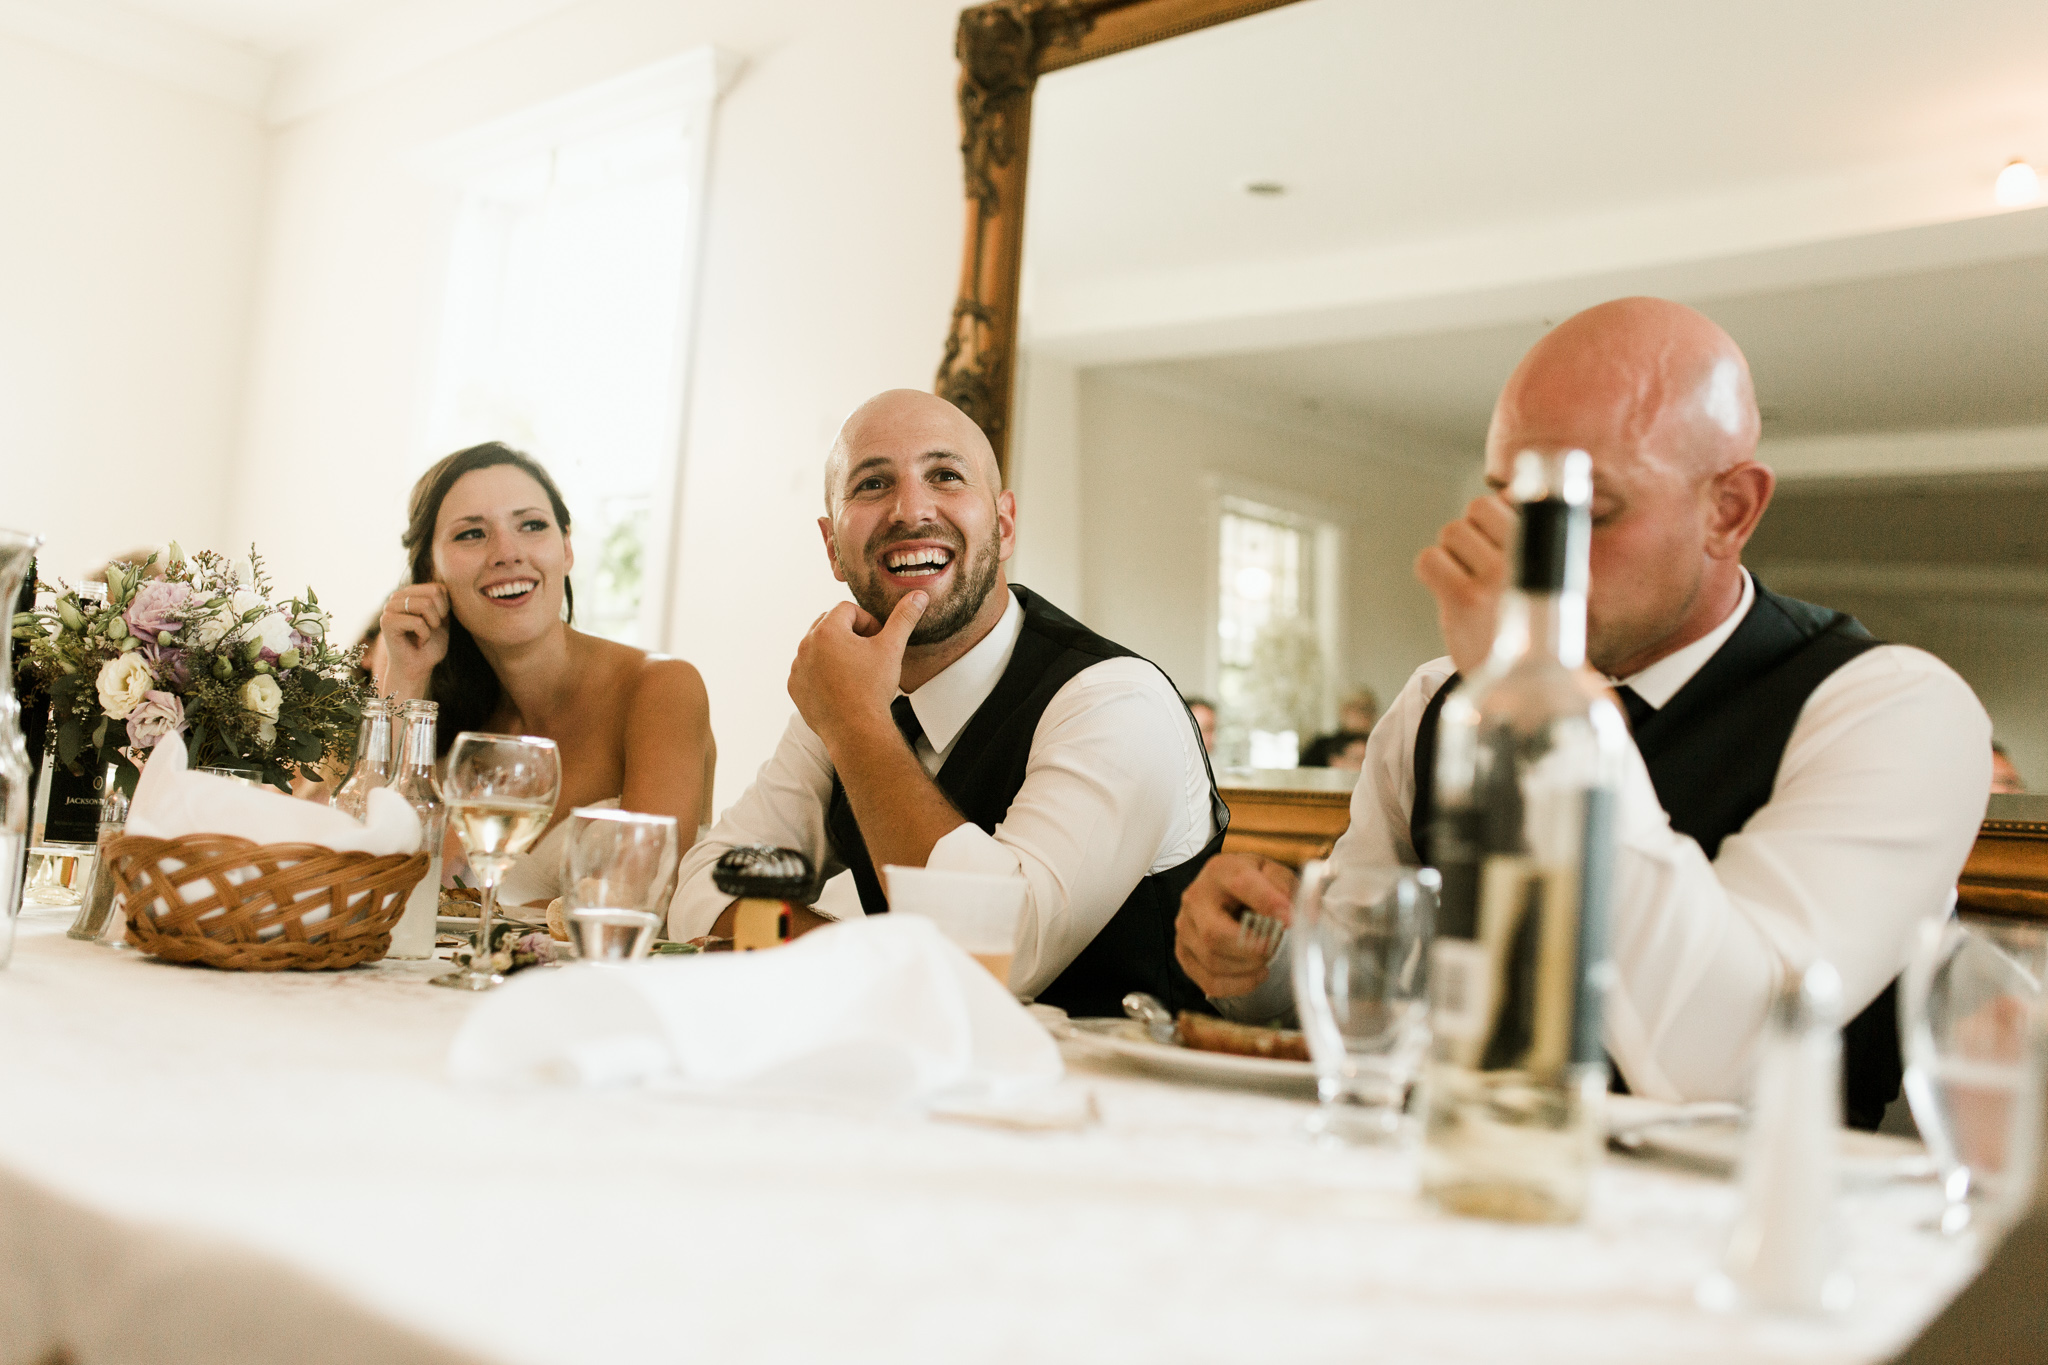 springer-house-burlington-wedding-photographer-558-of-756.jpg